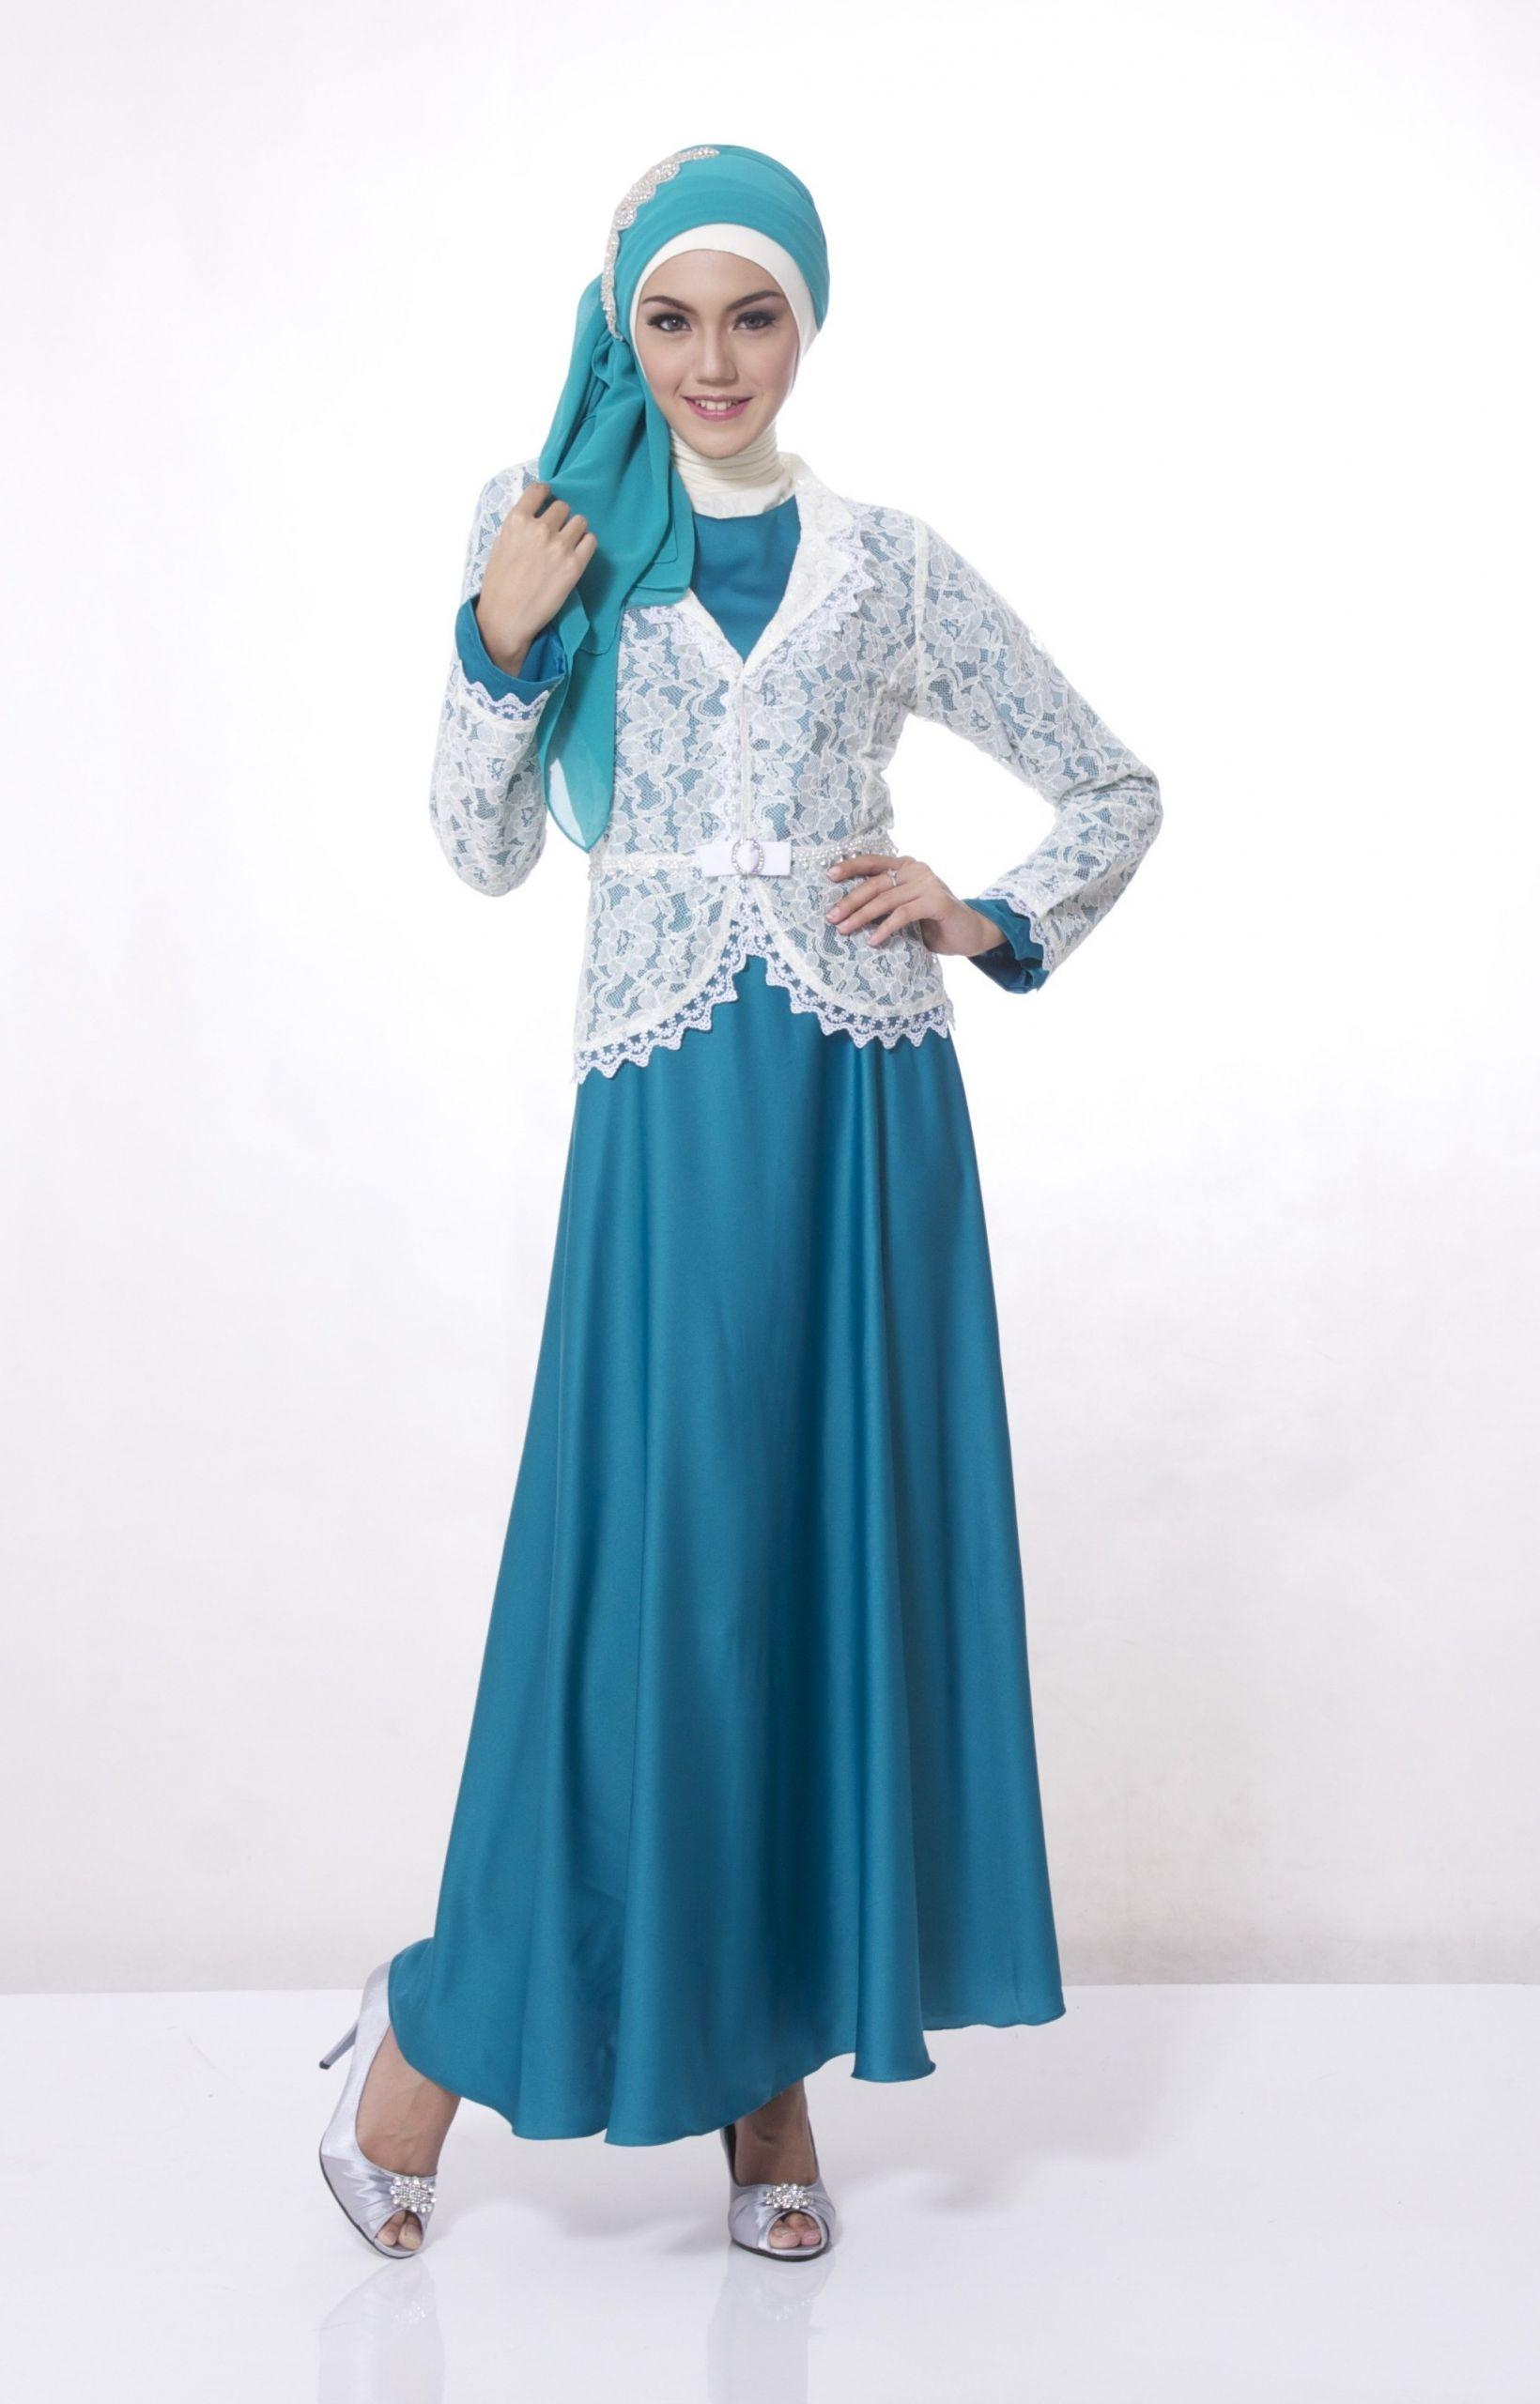 Ide Baju Lebaran Syahrini Zwd9 Contoh Desain Baju Muslim Terbaru Di 2015 – Pipitfashion